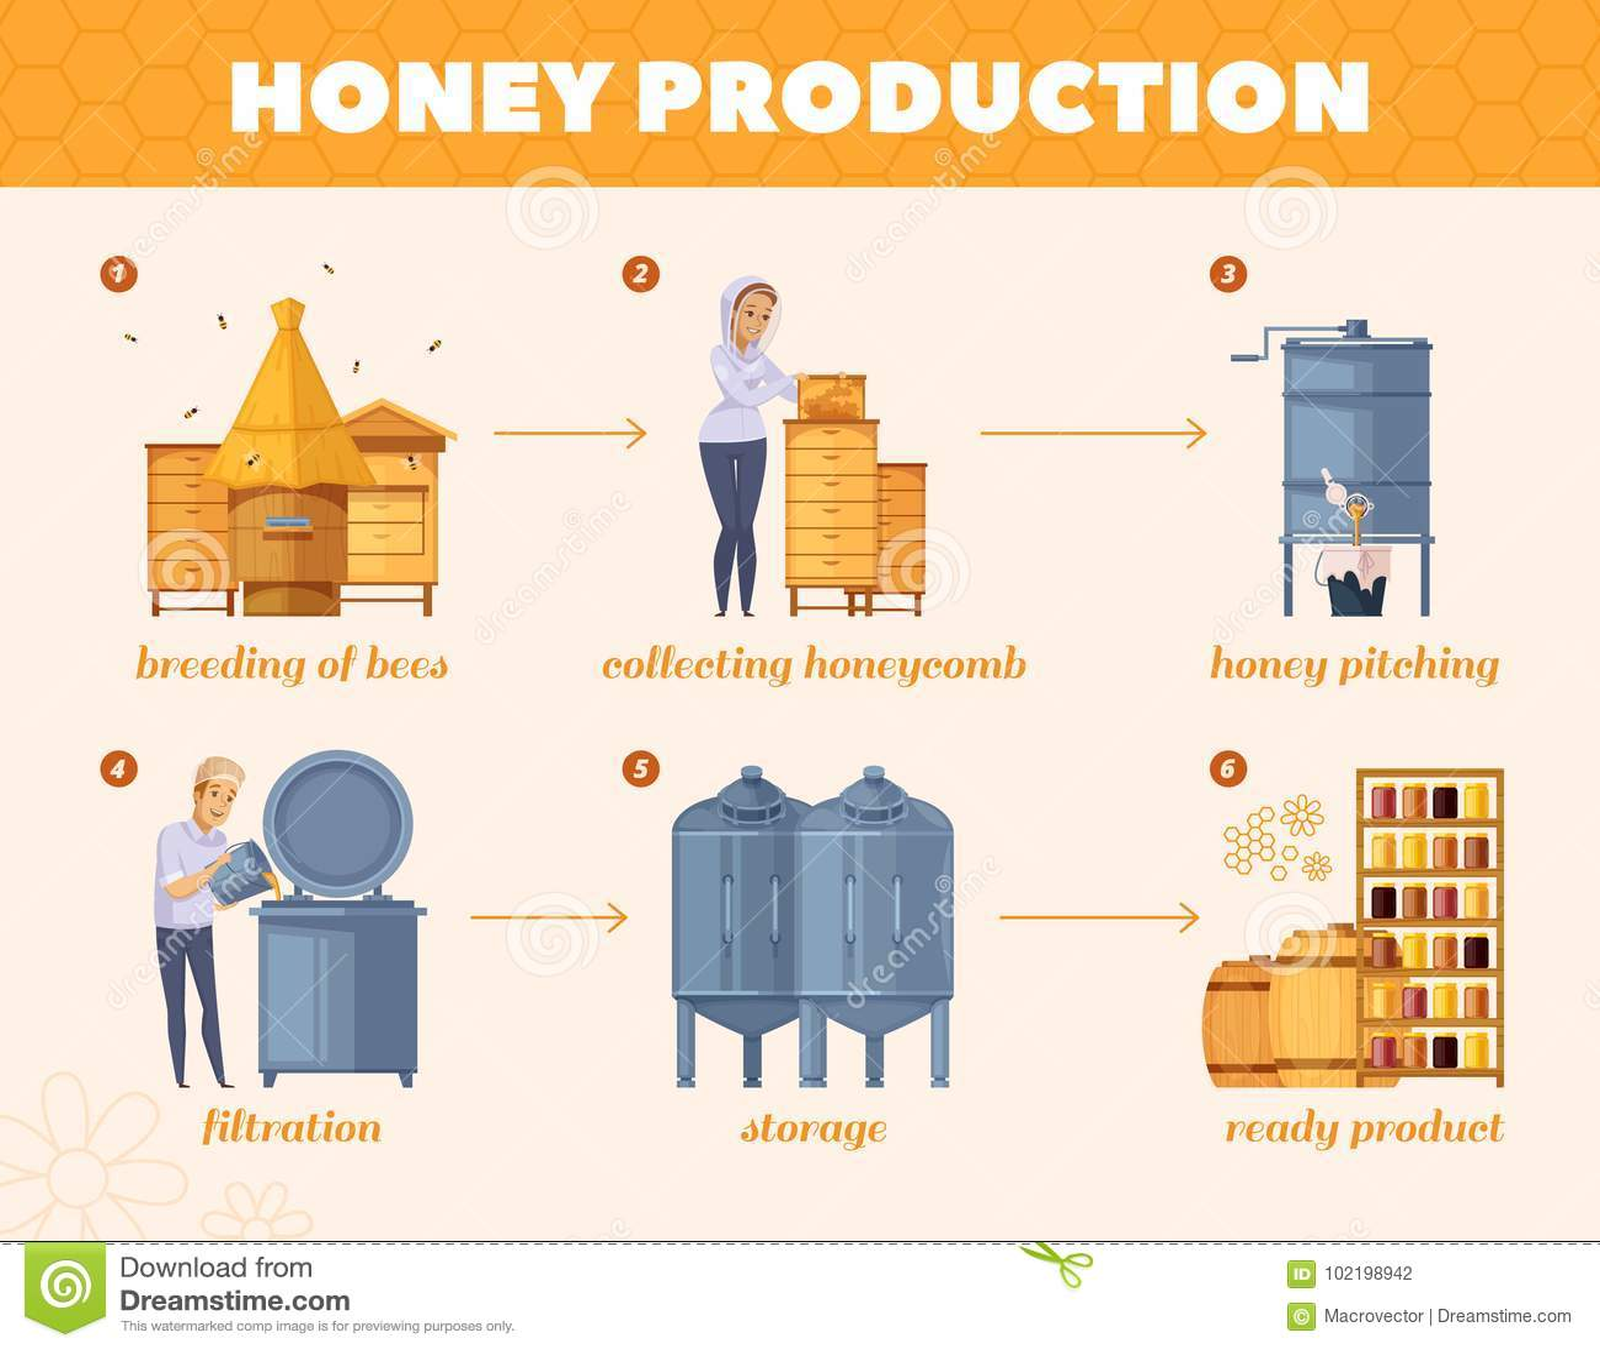 Honey Production Process Cartoon Flowchart